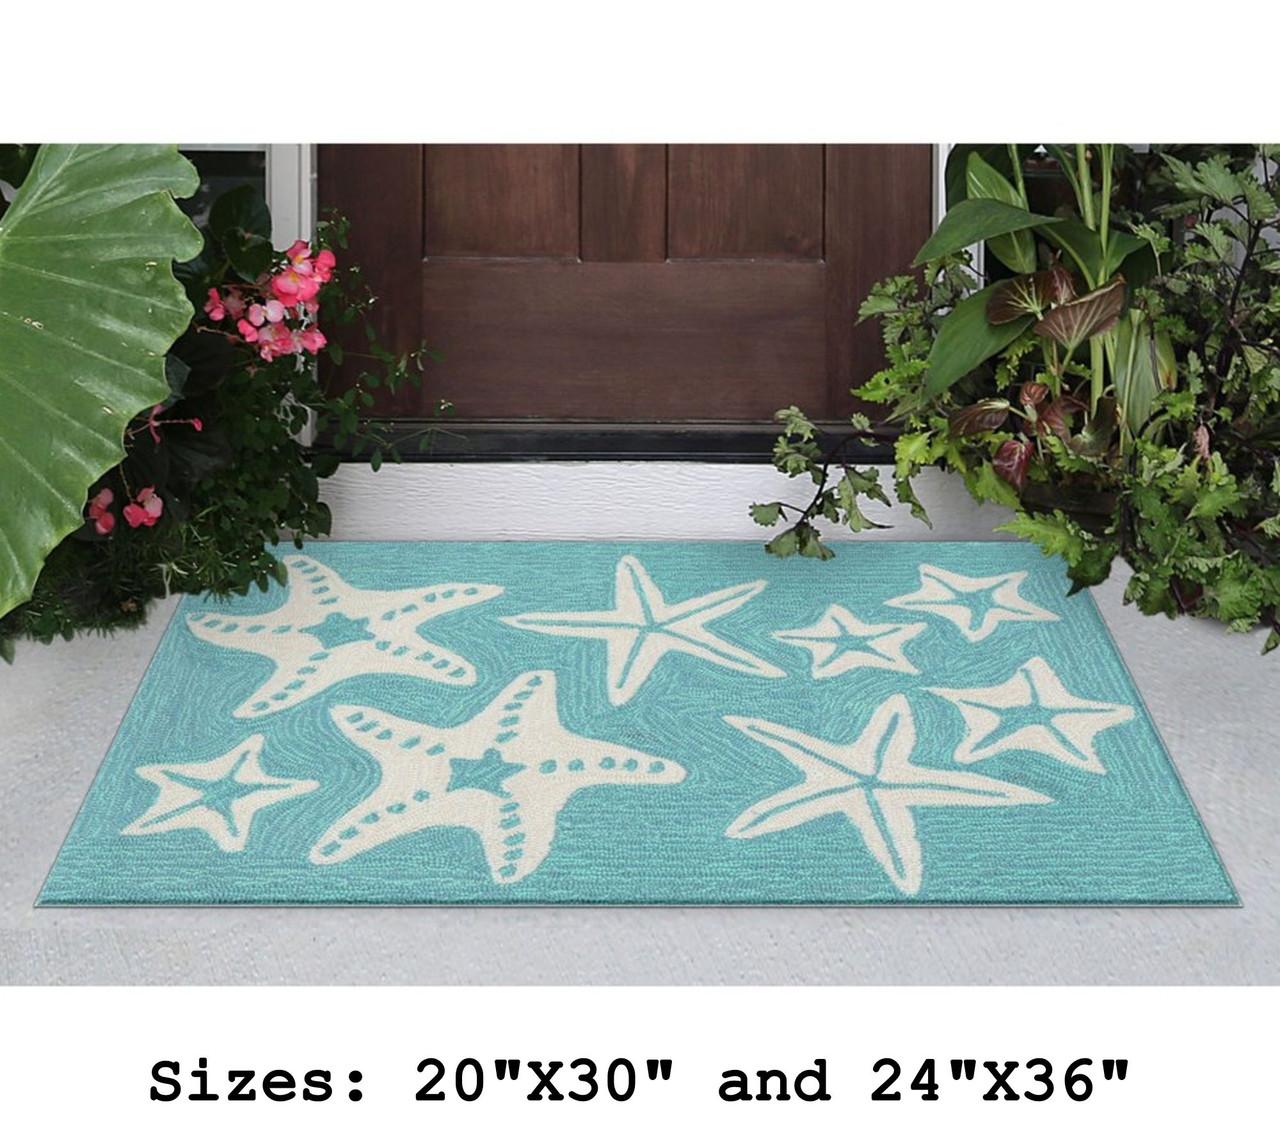 Aqua Capri Starfish Indoor/Outdoor Rug - Small Rectangle Lifestyle